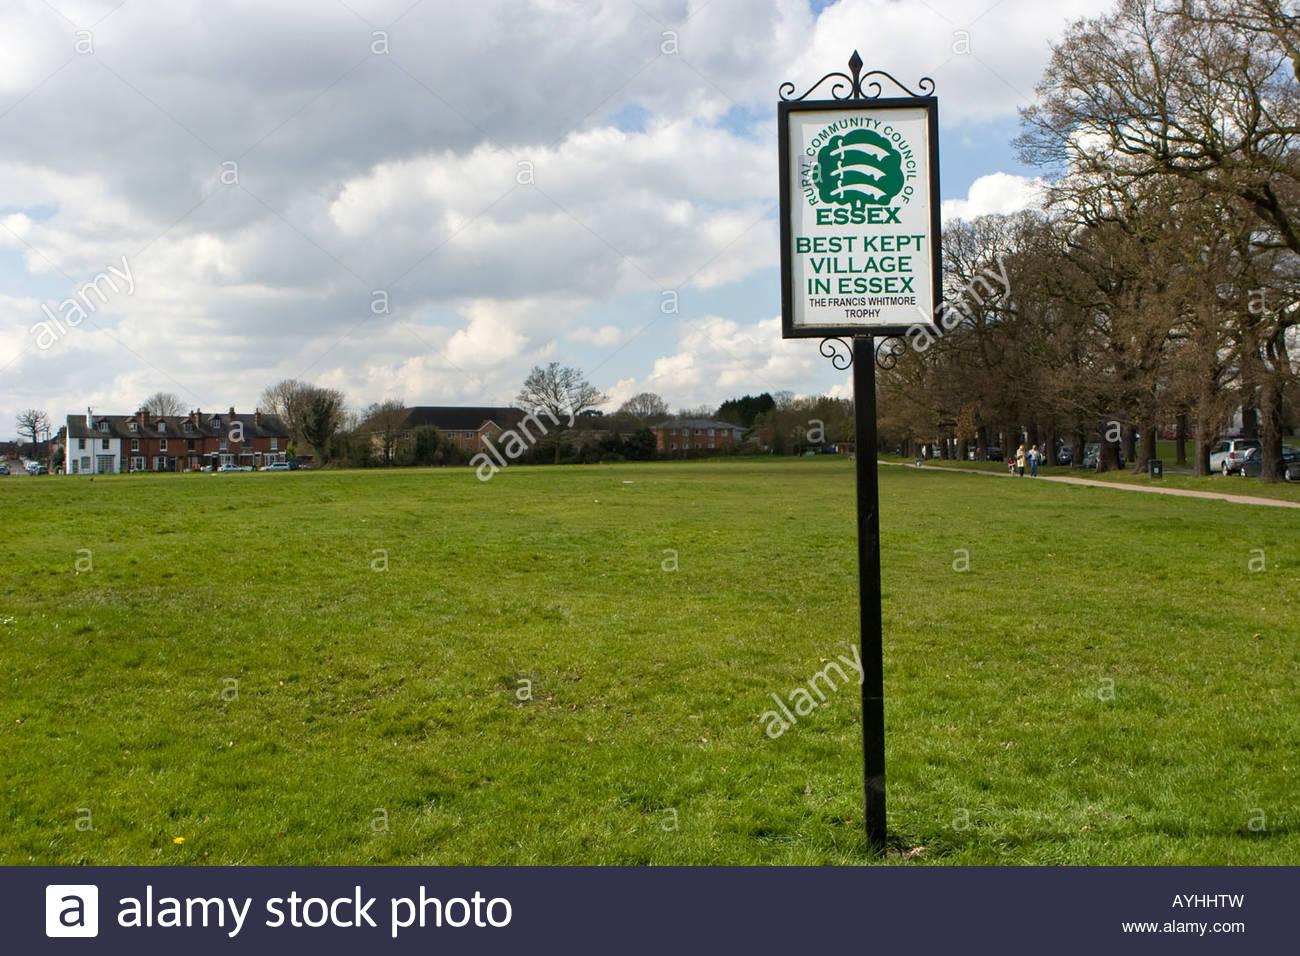 Best Kept Village In Essex sign, Theydon Bois, Essex, UK. - Stock Image